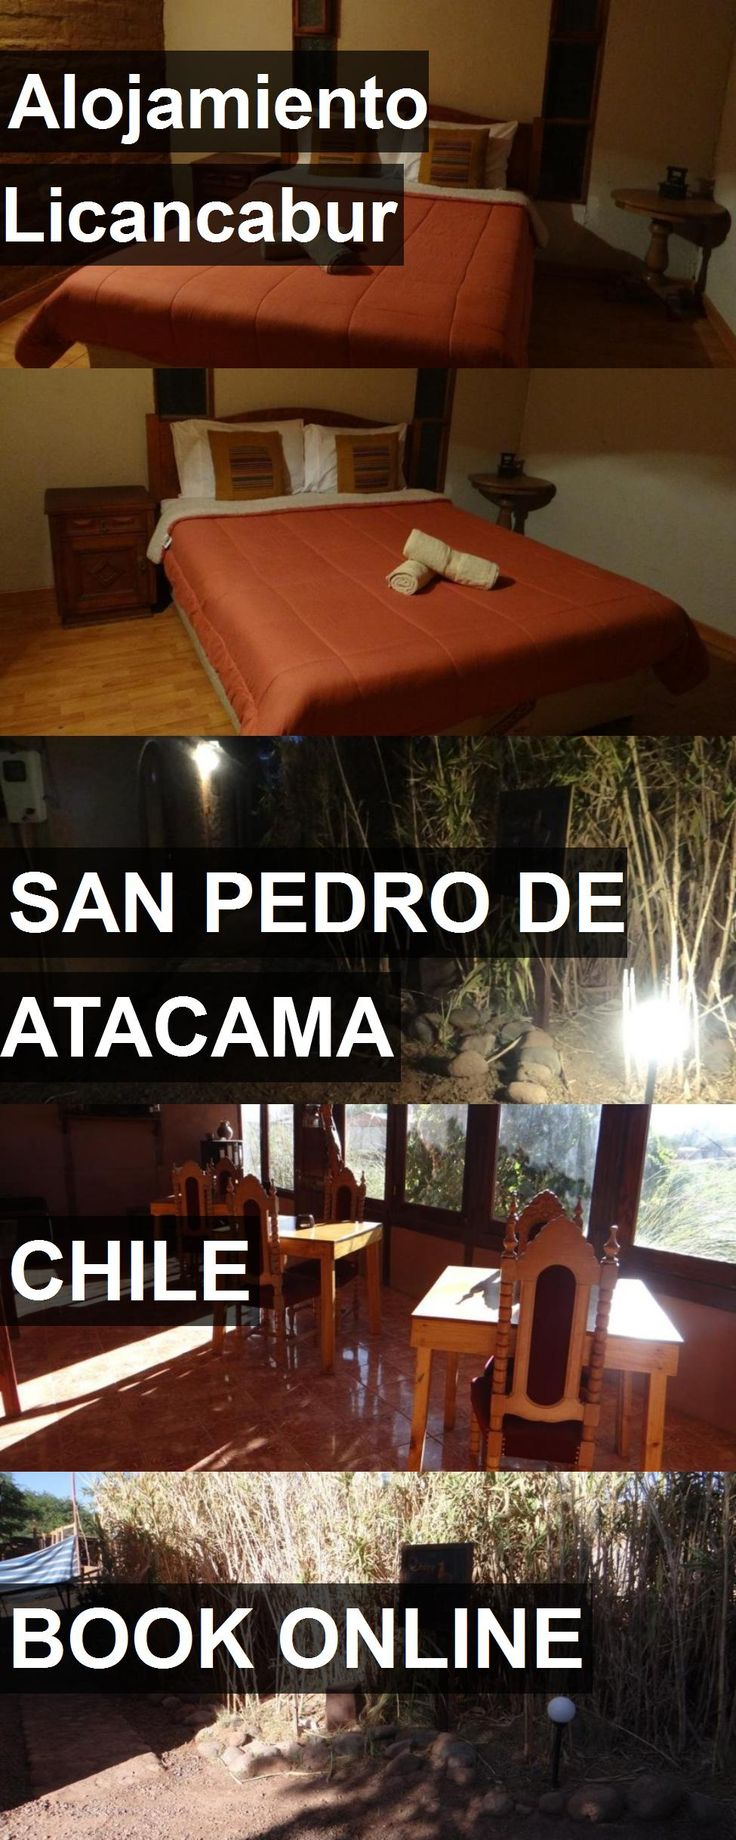 Hotel Alojamiento Licancabur in San Pedro De Atacama, Chile. For more information, photos, reviews and best prices please follow the link. #Chile #SanPedroDeAtacama #AlojamientoLicancabur #hotel #travel #vacation